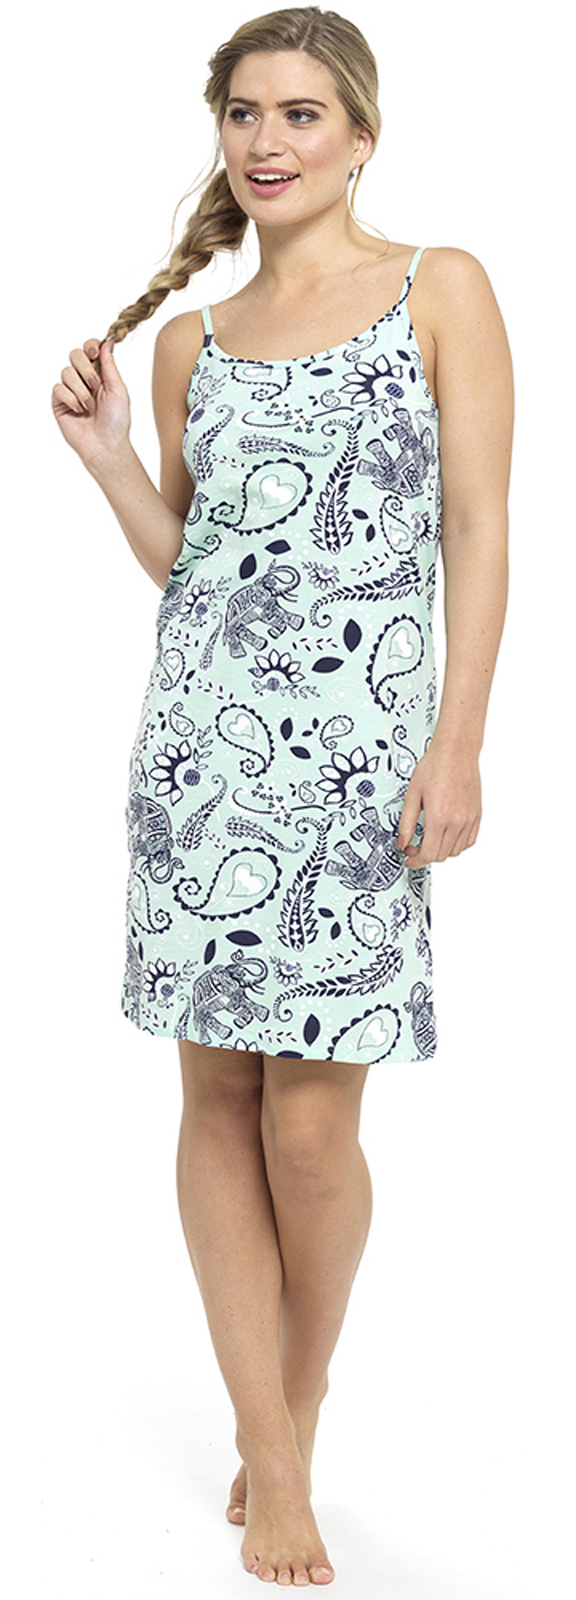 Womens Nightdress Chemise Strappy Nightie 100% Cotton Nightwear Slip ... 77b6c2807